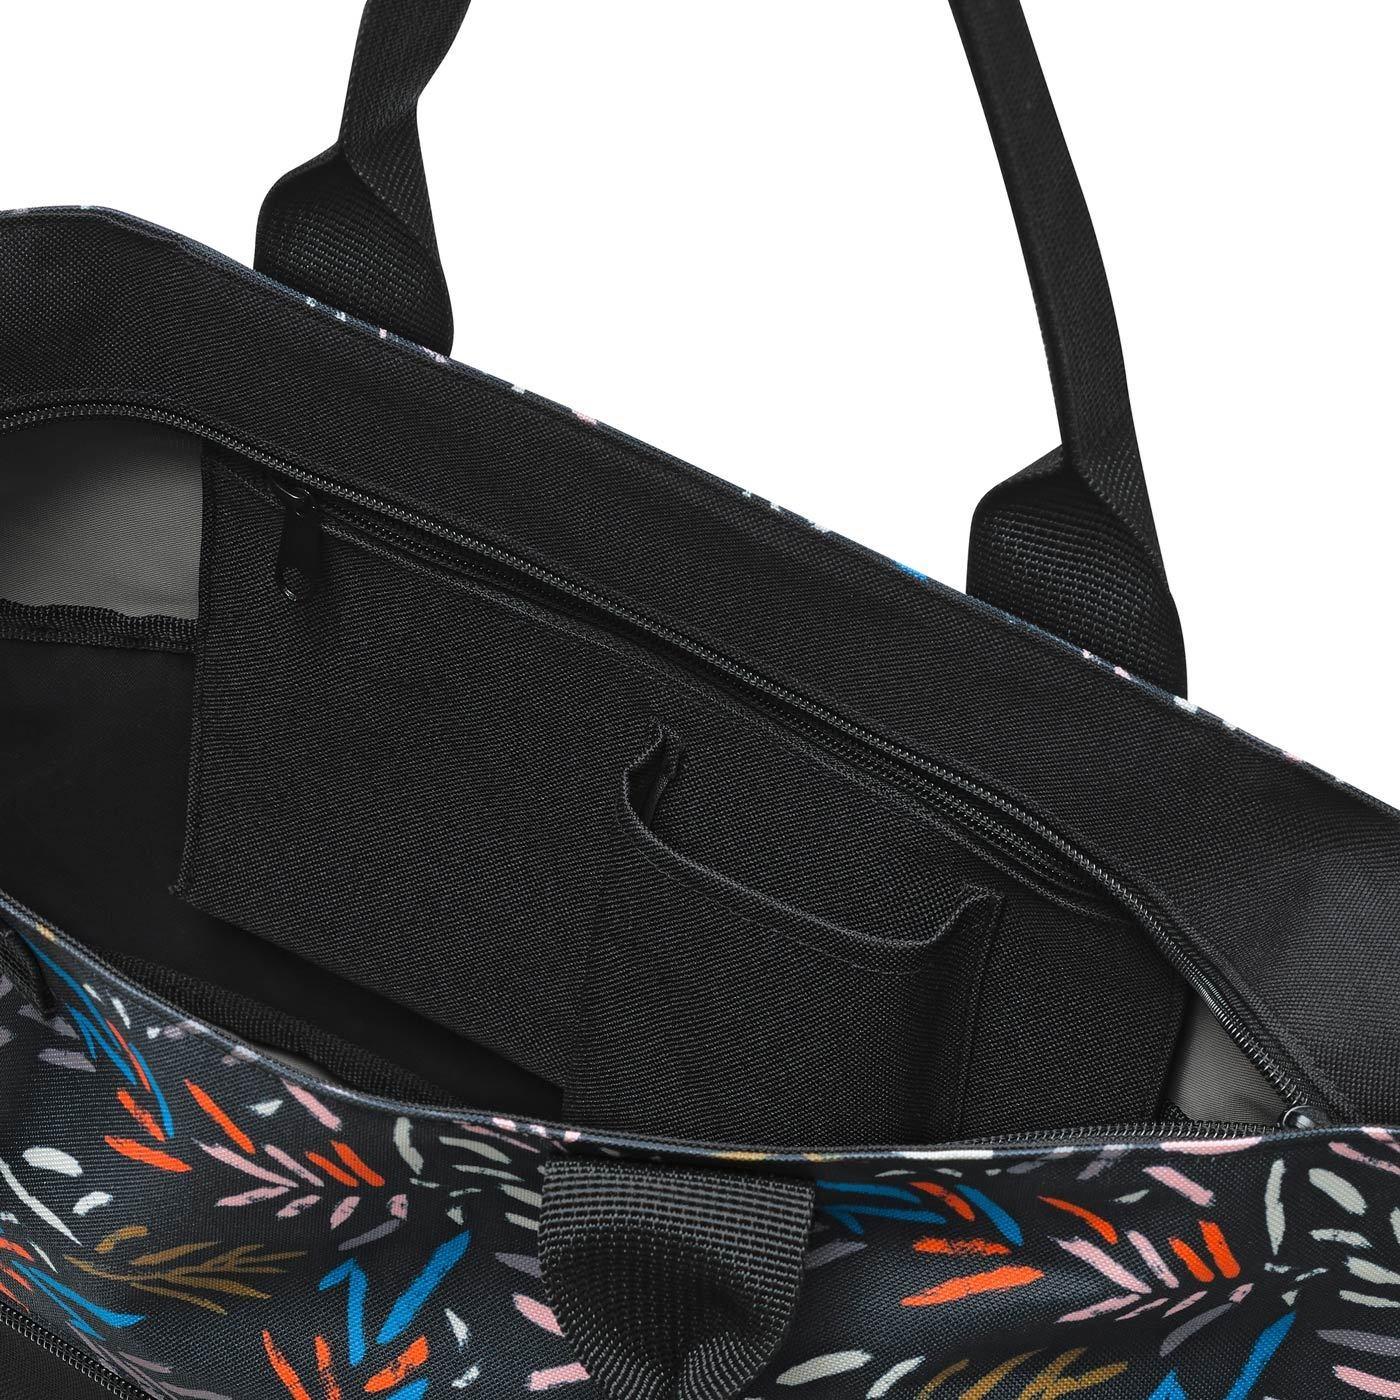 Chytrá taška přes rameno Shopper e1 autumn 1_1